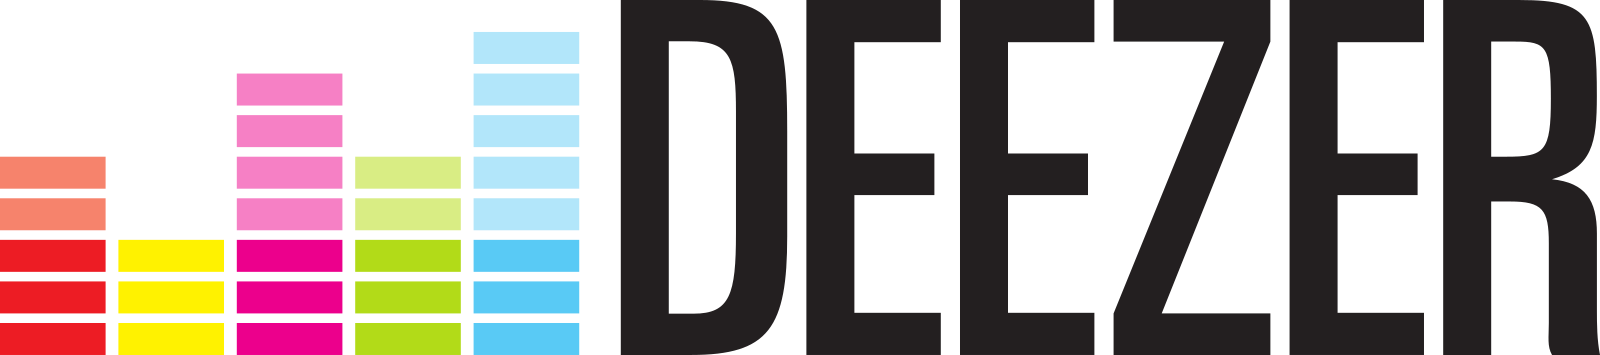 deezer logo 2 - Deezer Logo